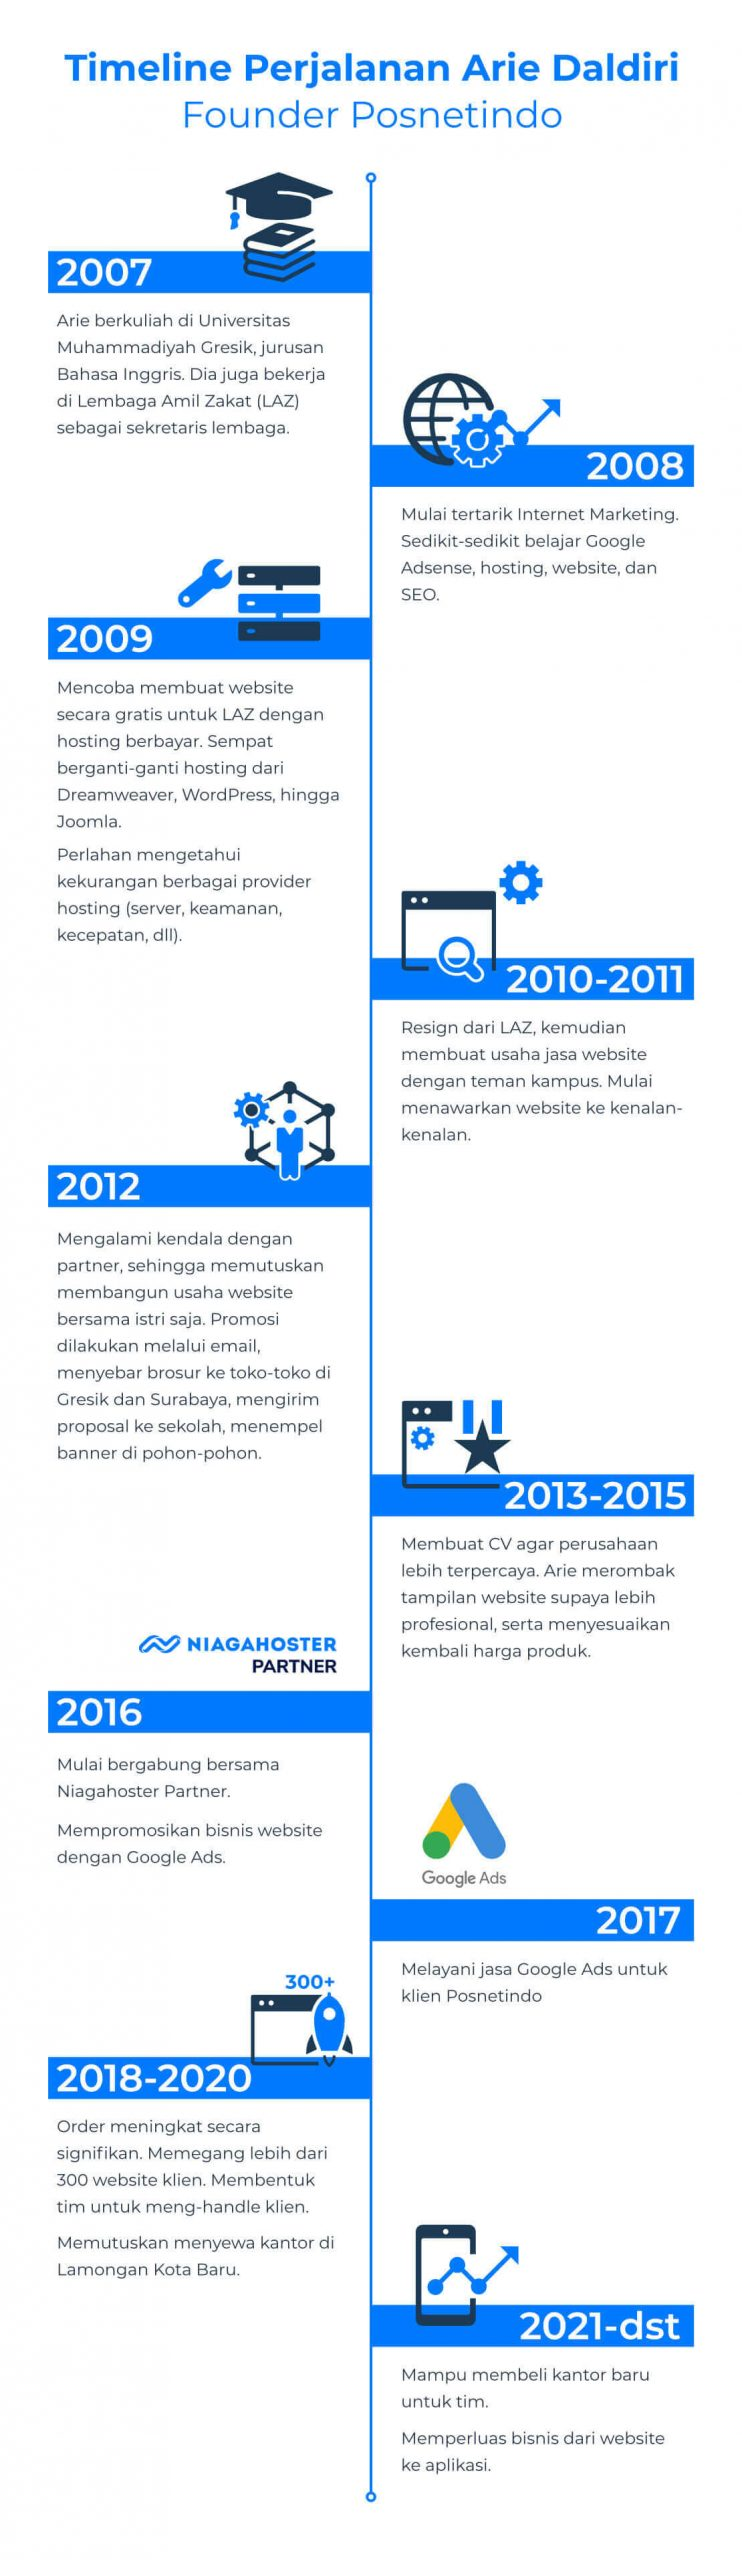 Timeline Perjalanan Arie Daldiri, Founder Posnetindo